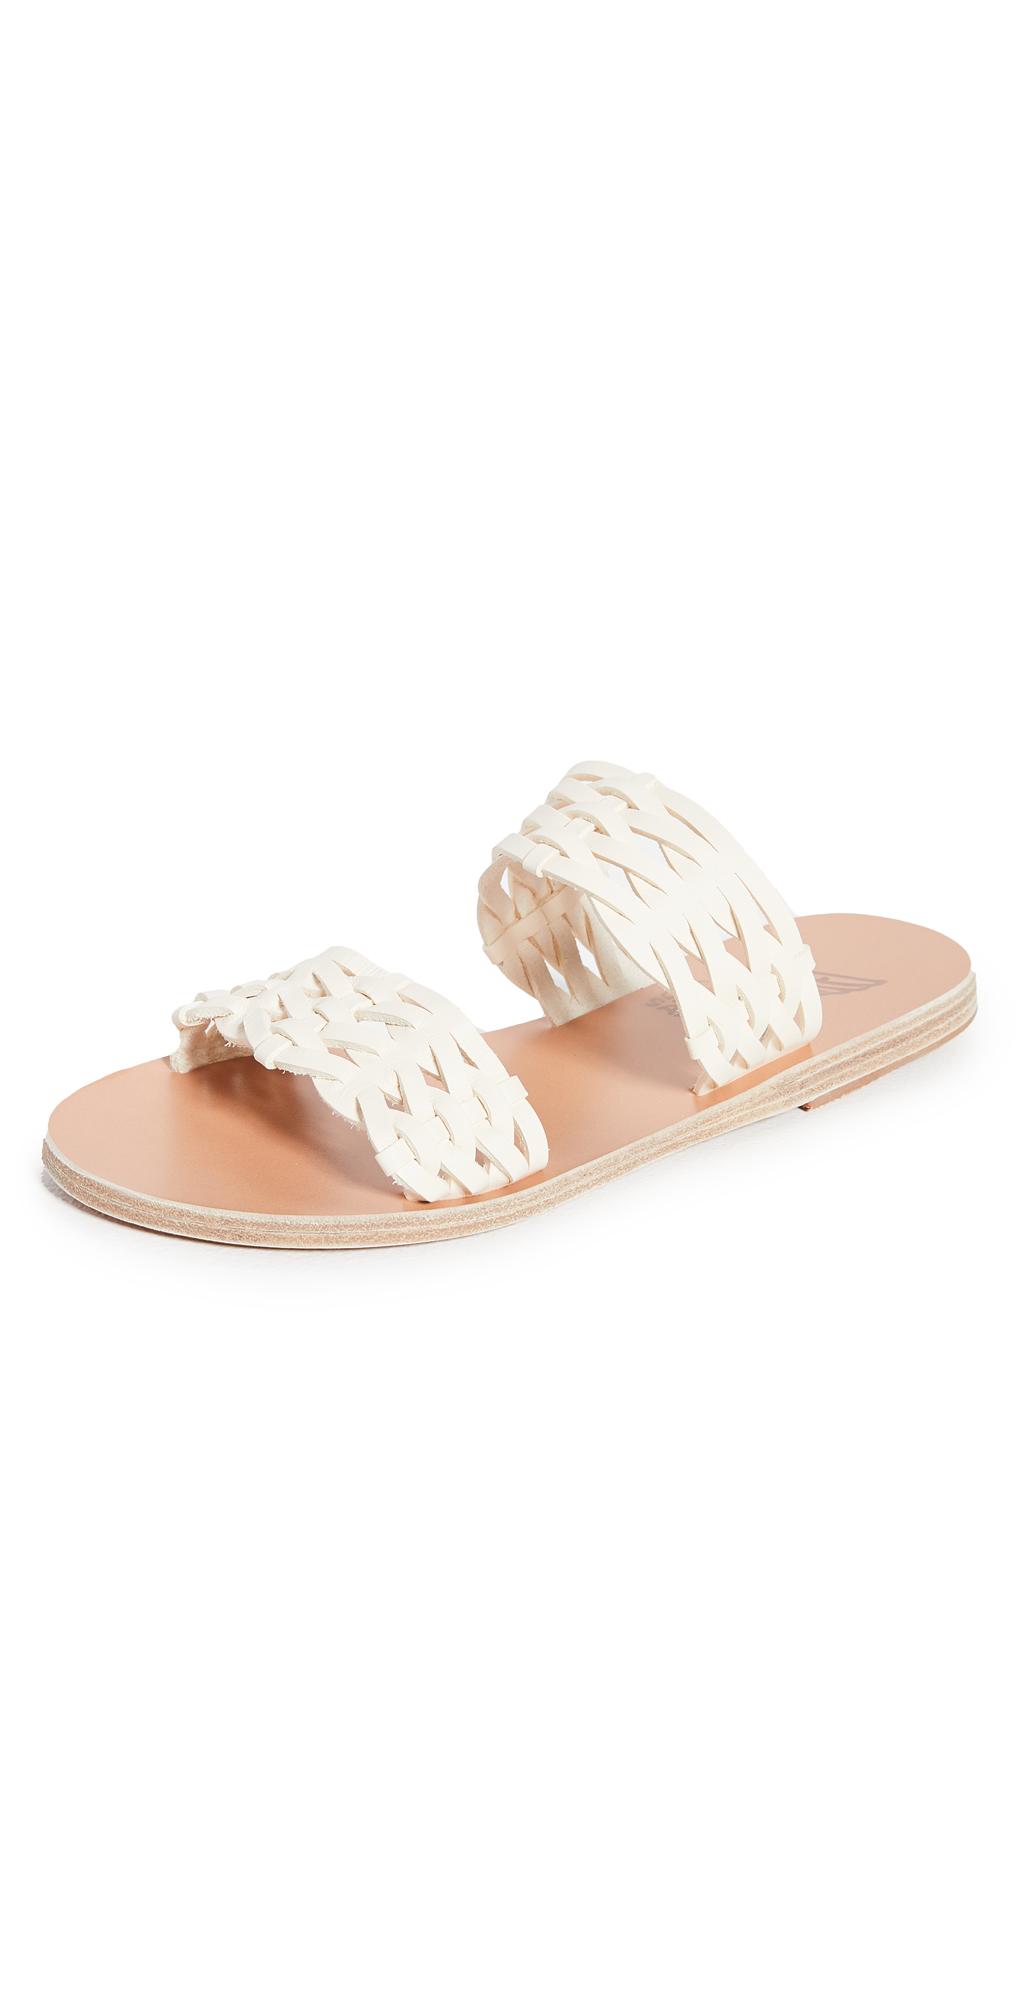 Ancient Greek Sandals Melia Woven Sandals